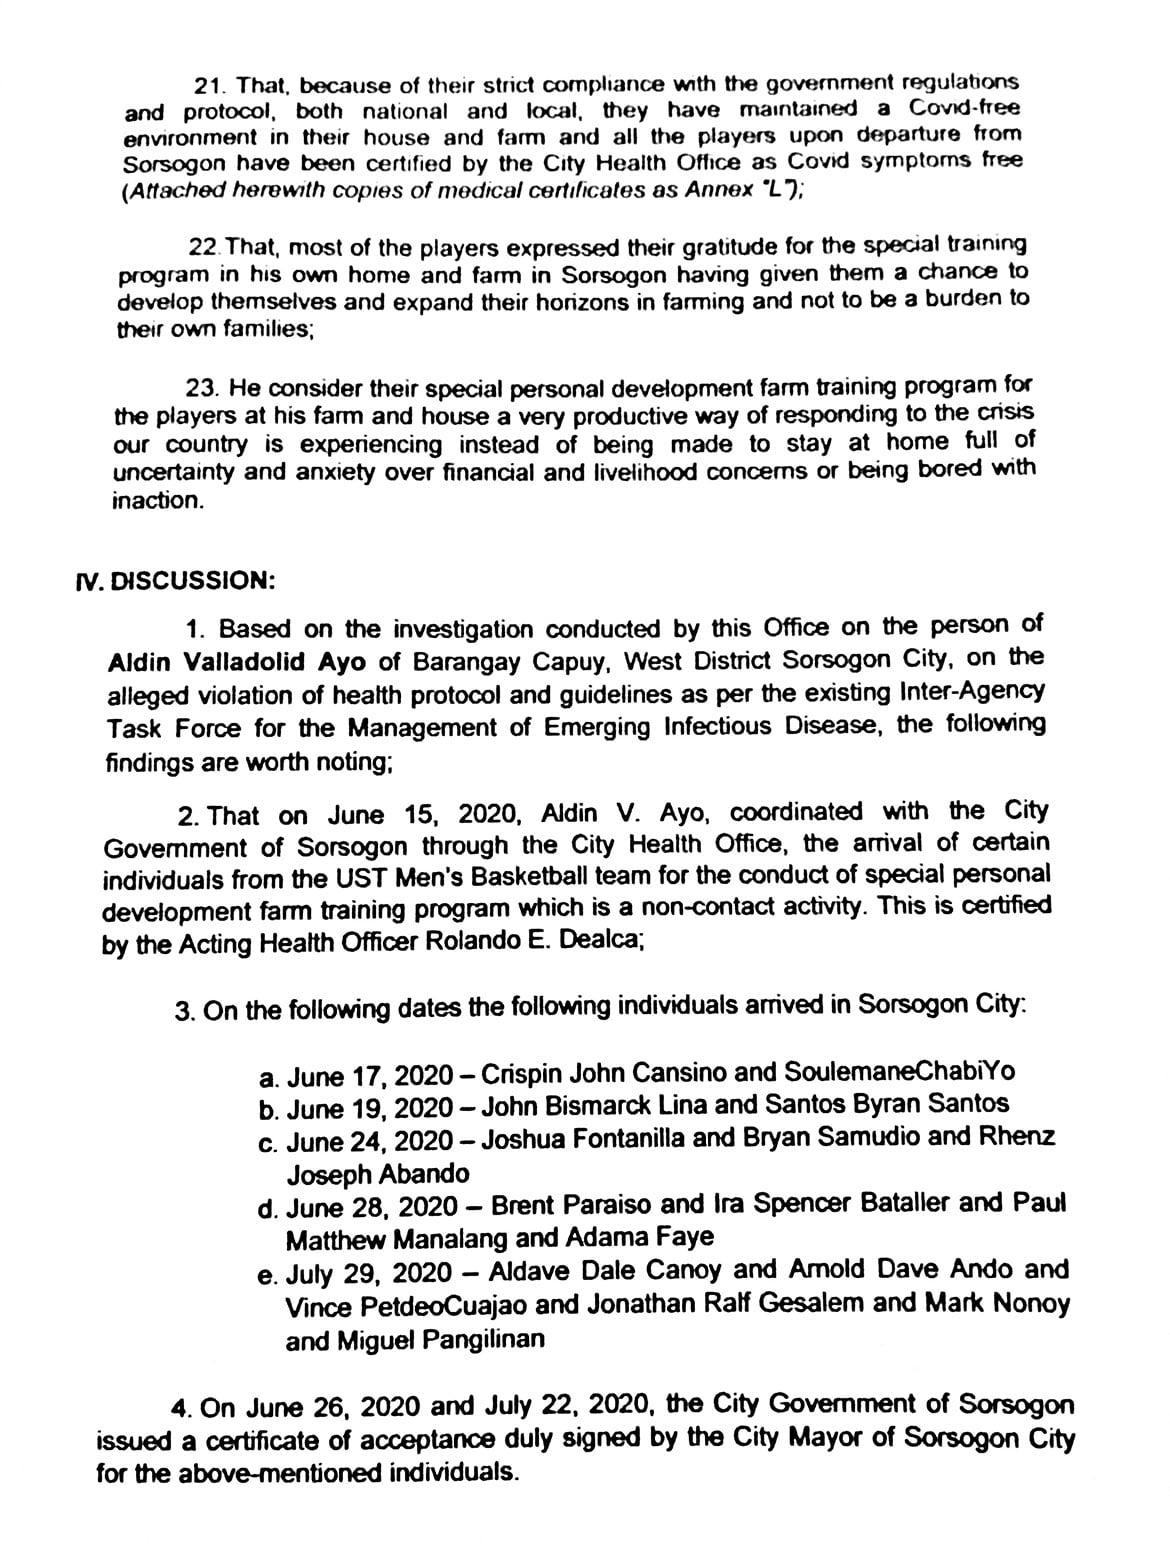 Tiebreaker Times PNP, Gov. Escudero absolve Aldin Ayo of liability from 'Bicol bubble' Basketball News UAAP UST  UST Men's Basketball UAAP Season 83 Men's Basketball UAAP Season 83 Coronavirus Pandemic Aldin Ayo